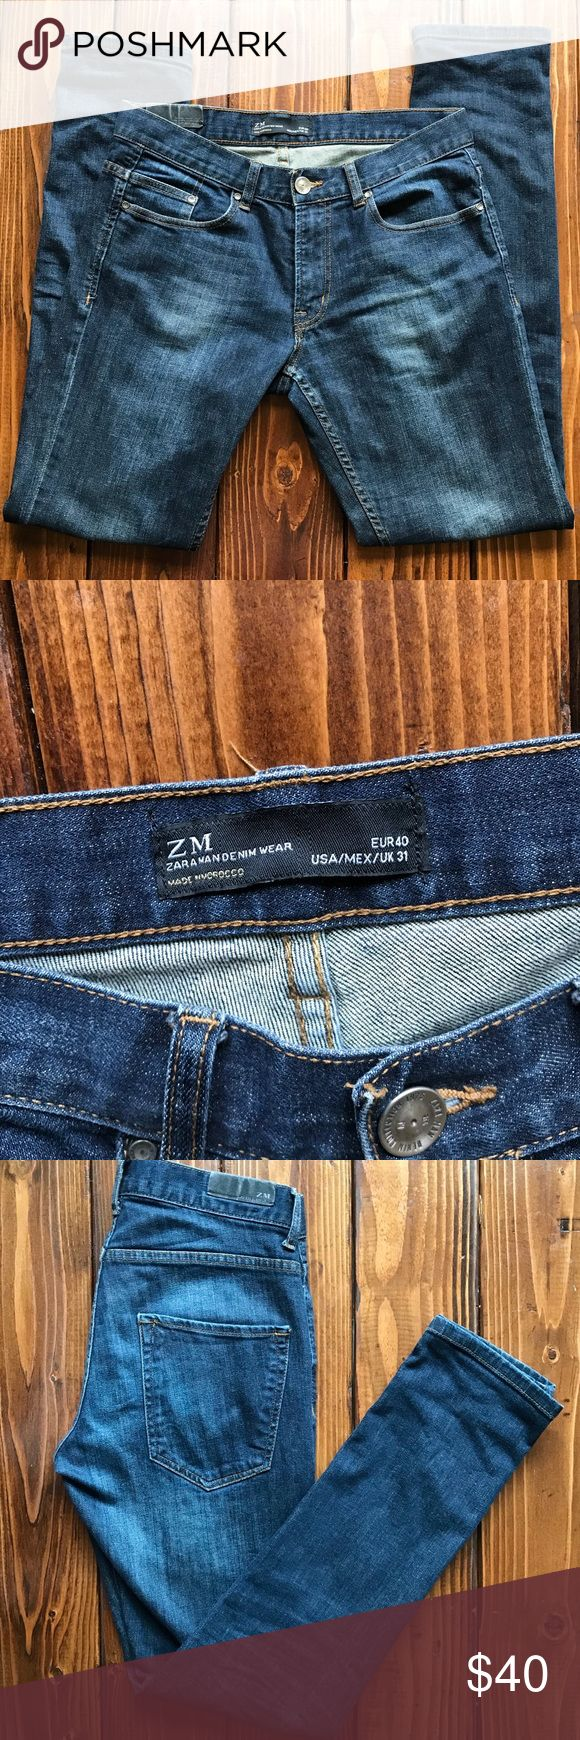 Zara Man Denim Wear Skinny Jeans Size 31 Zara Man Denim Wear Skinny Jeans for Men. Size 31. Inseam 32. Nice washed dark blue color. Faded label. Excellent condition. No flaws. Make me an offer! :) Zara Jeans Skinny